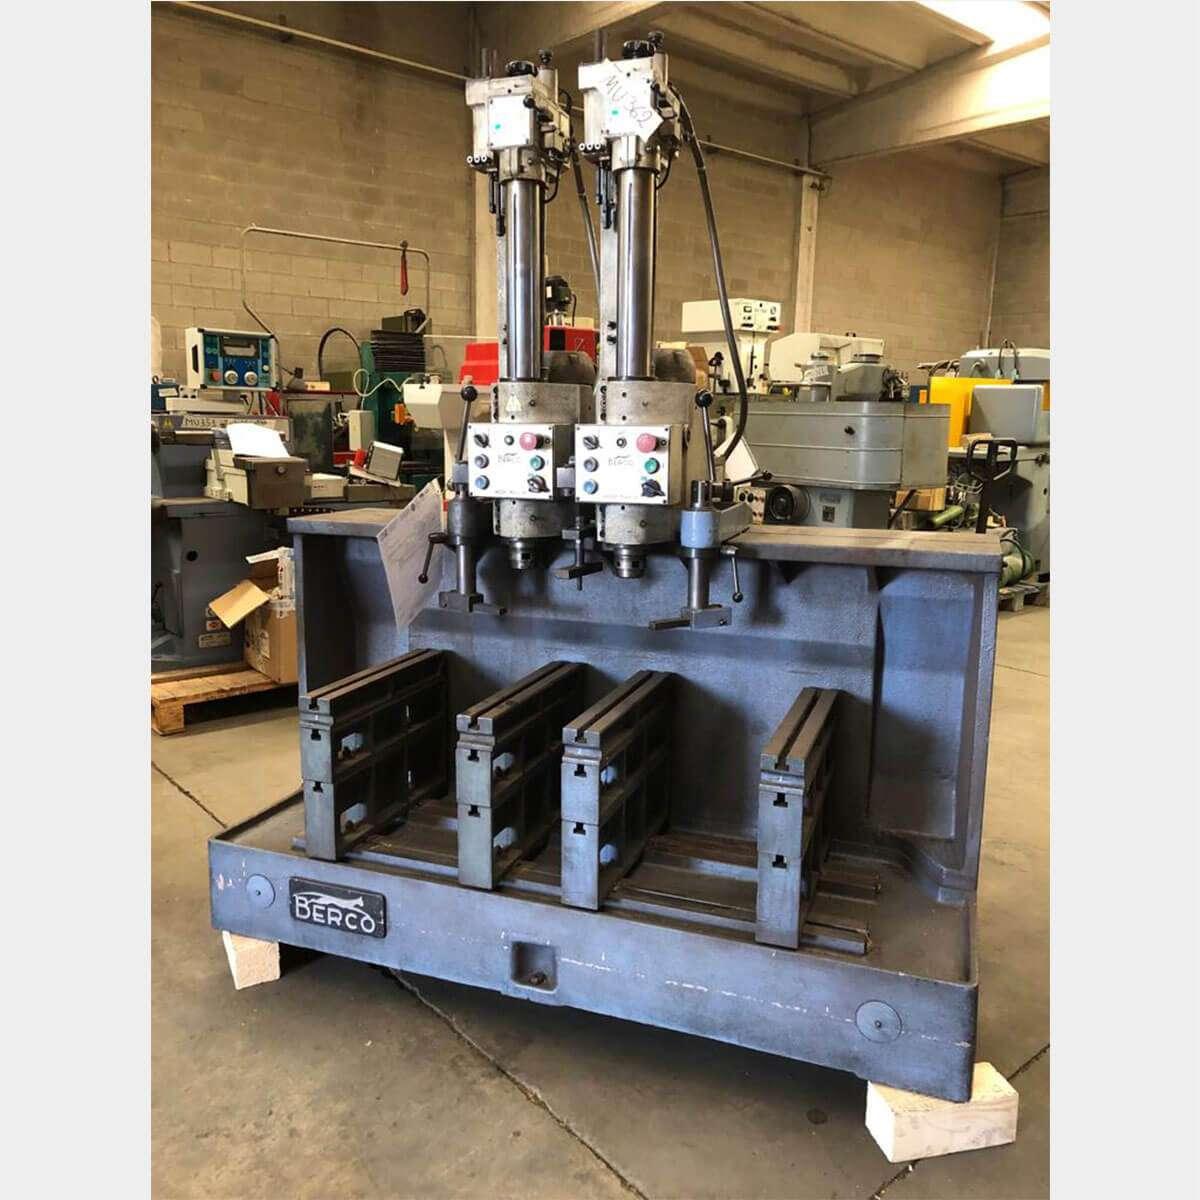 BERCOACP 155-22cylinder boring machine